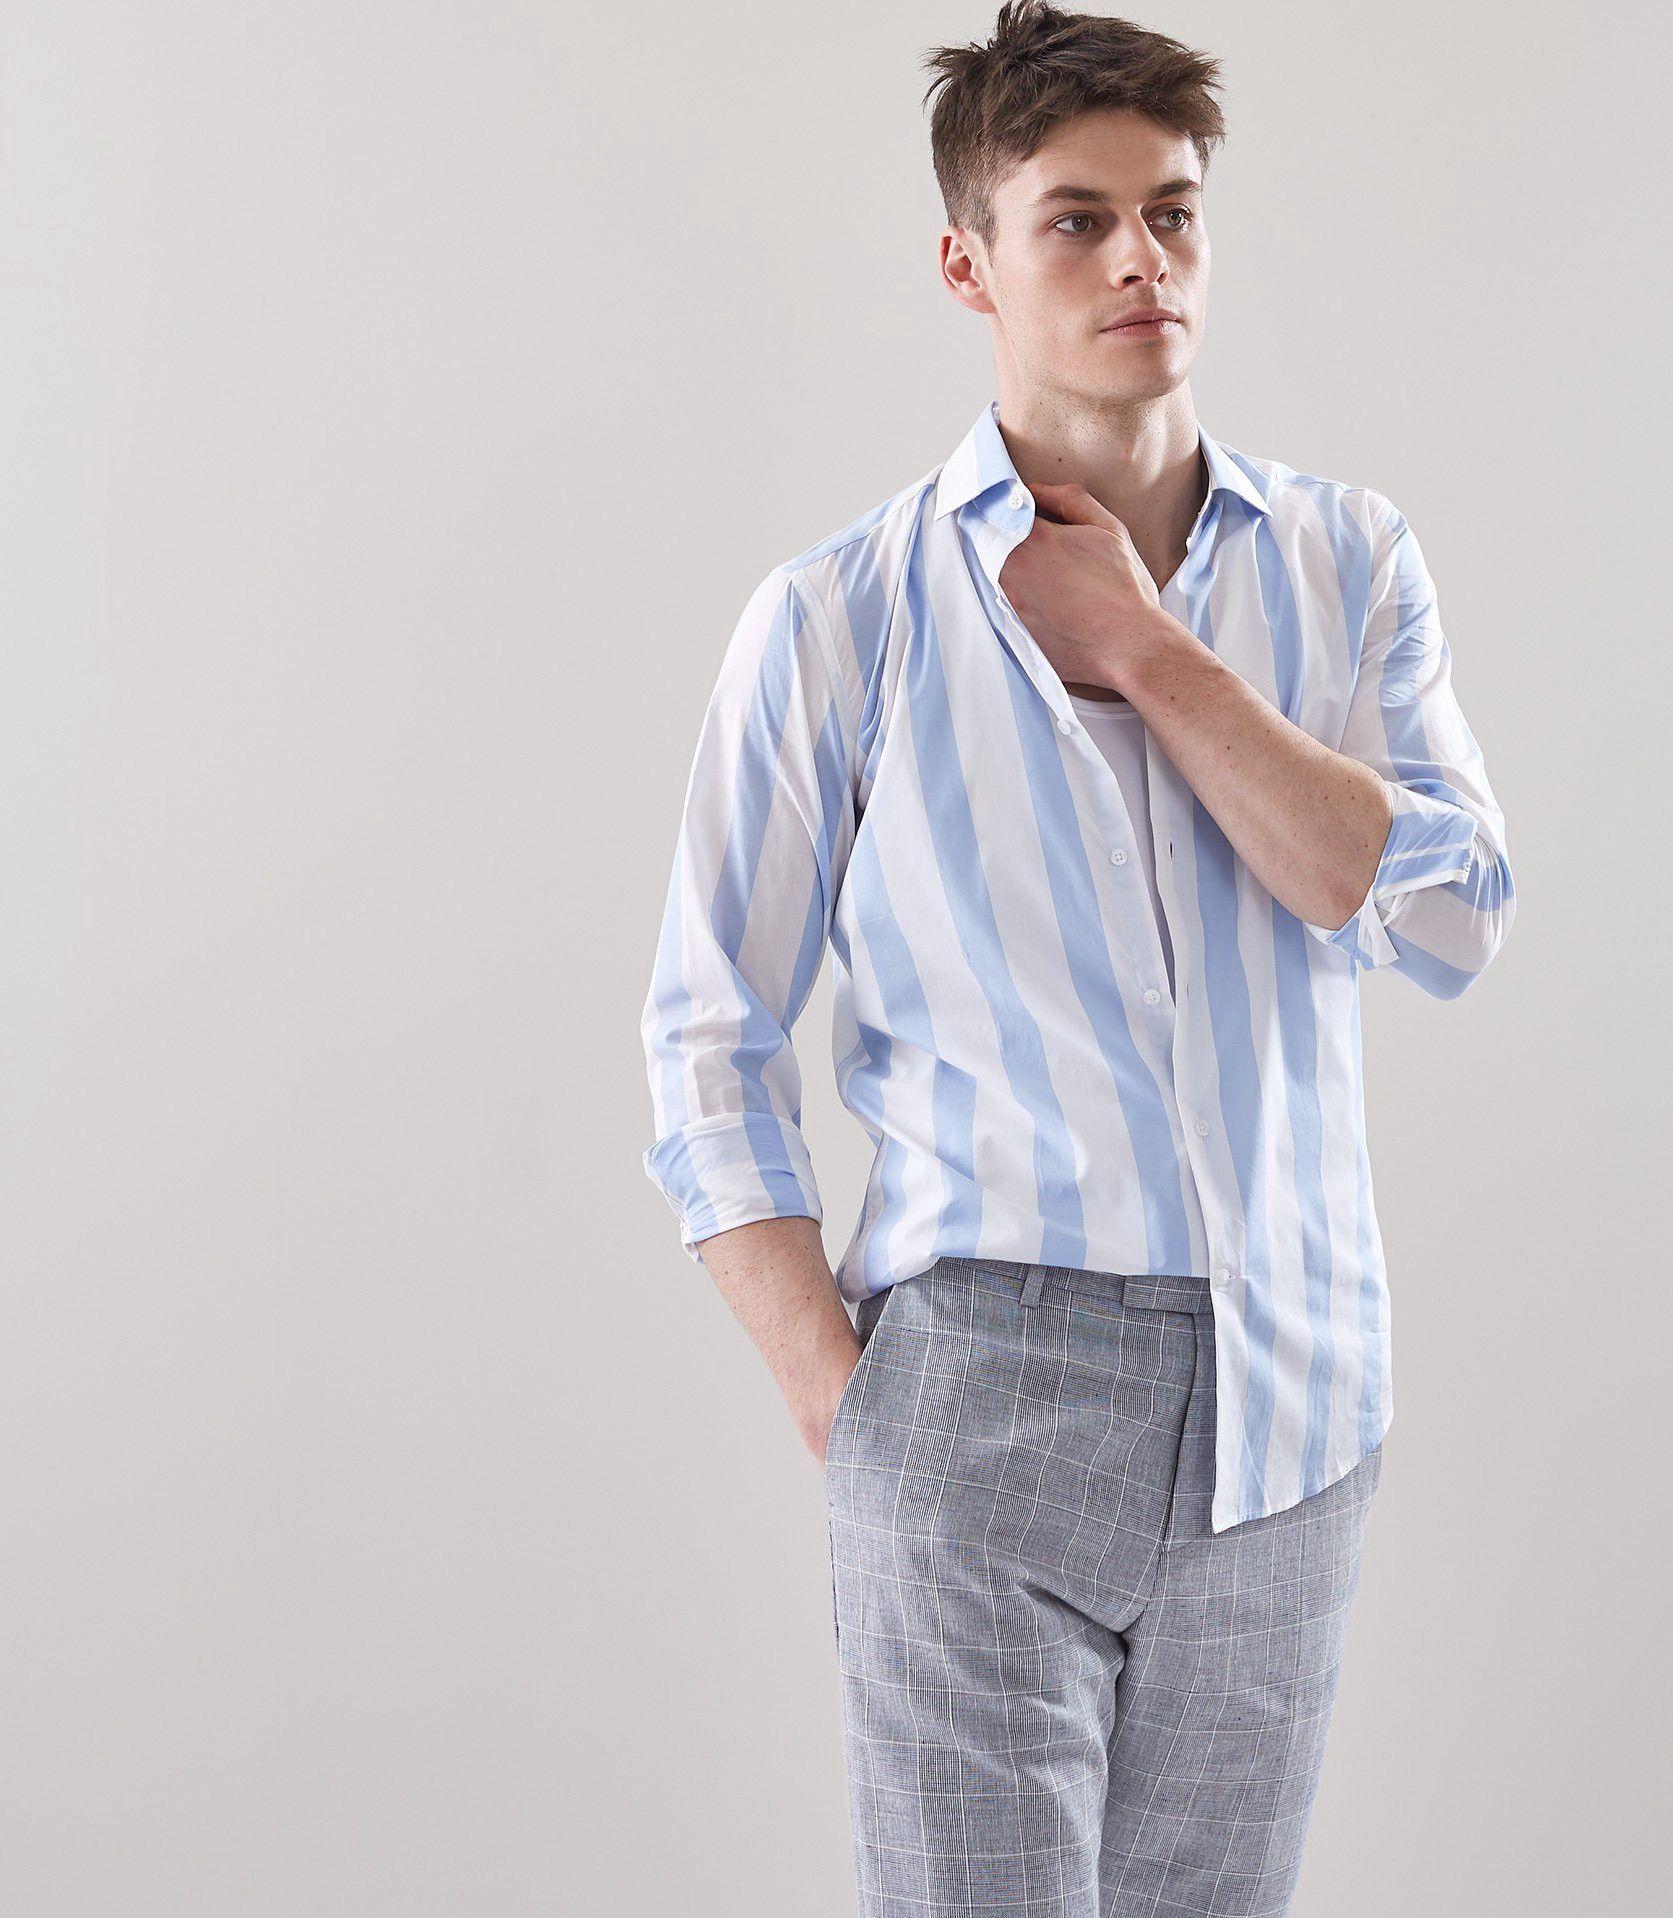 c8da2e8602 Reiss Marcus Wide Striped Shirt Soft Blue - XXL | Products | Blue ...